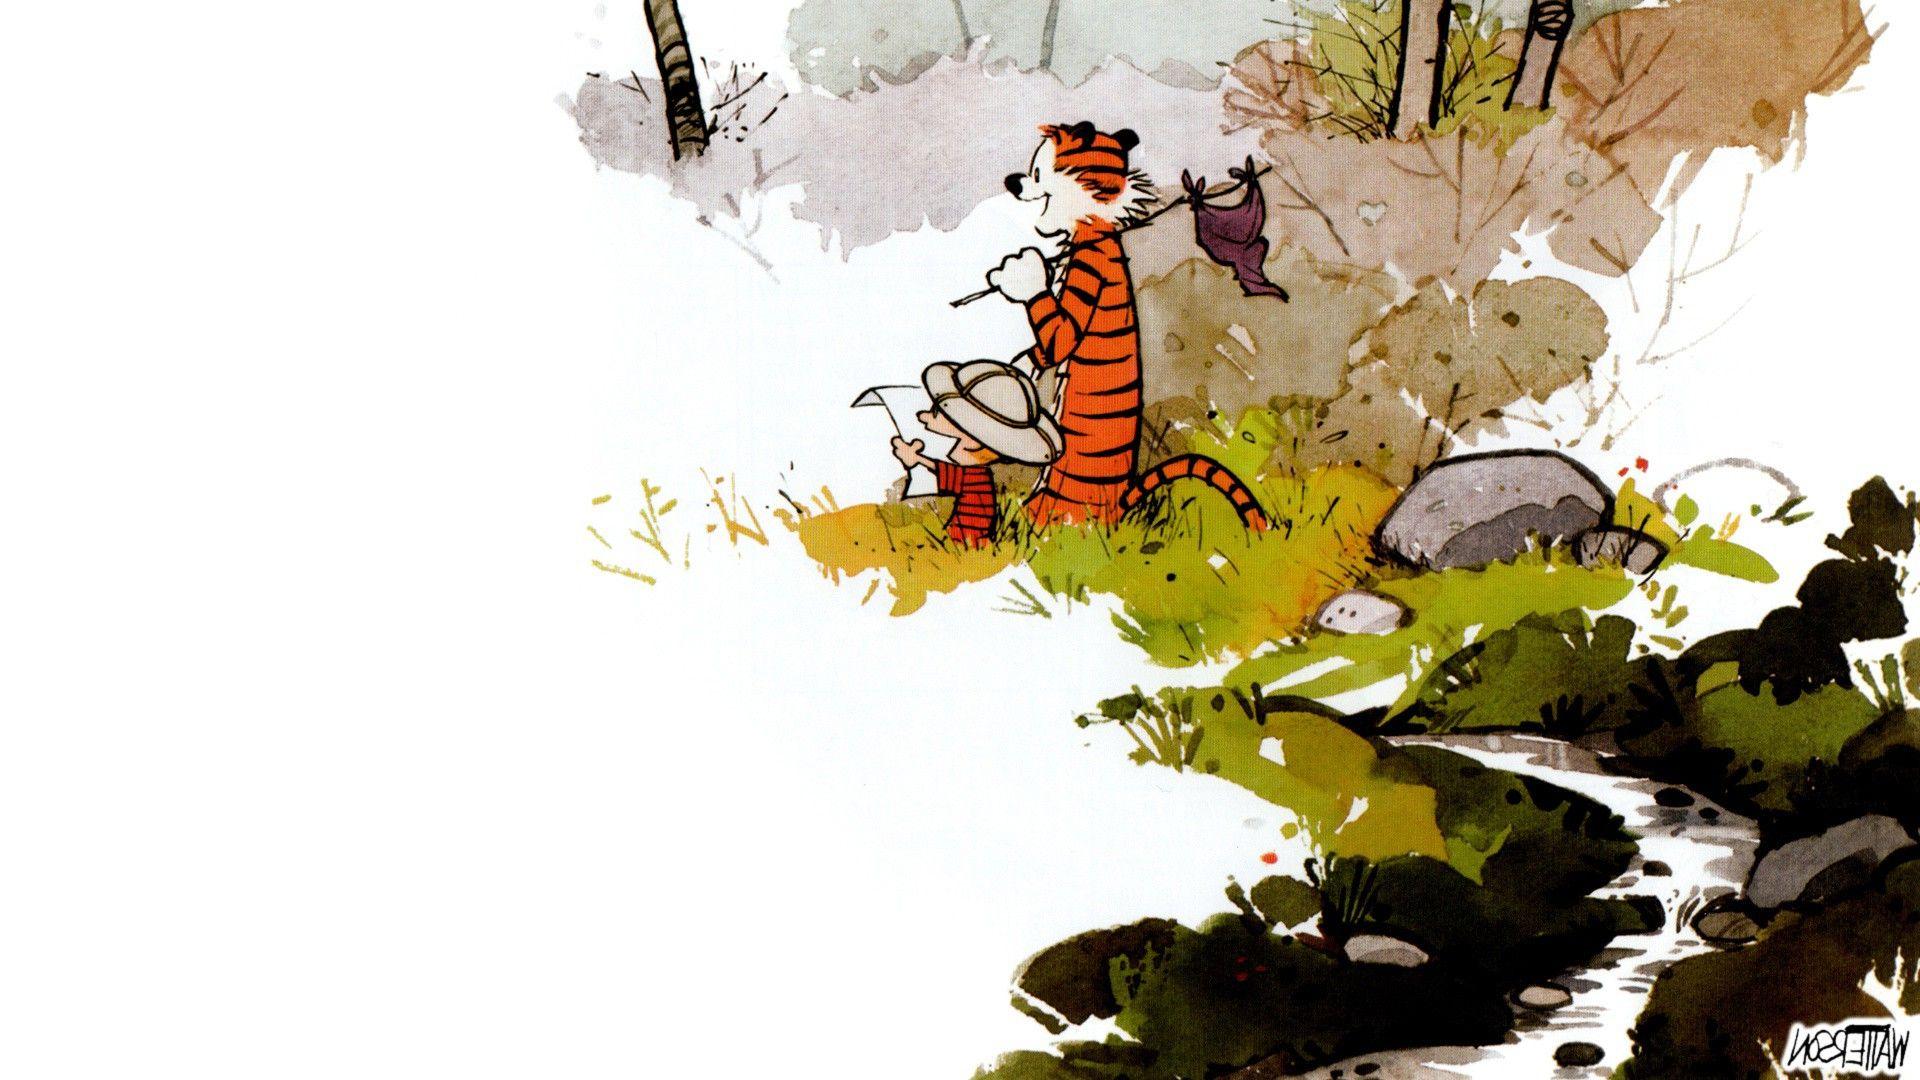 Amazing Wallpaper Mac Calvin And Hobbes - bbb6190543cd45785f13e39a20c353bc  Graphic_855126.jpg